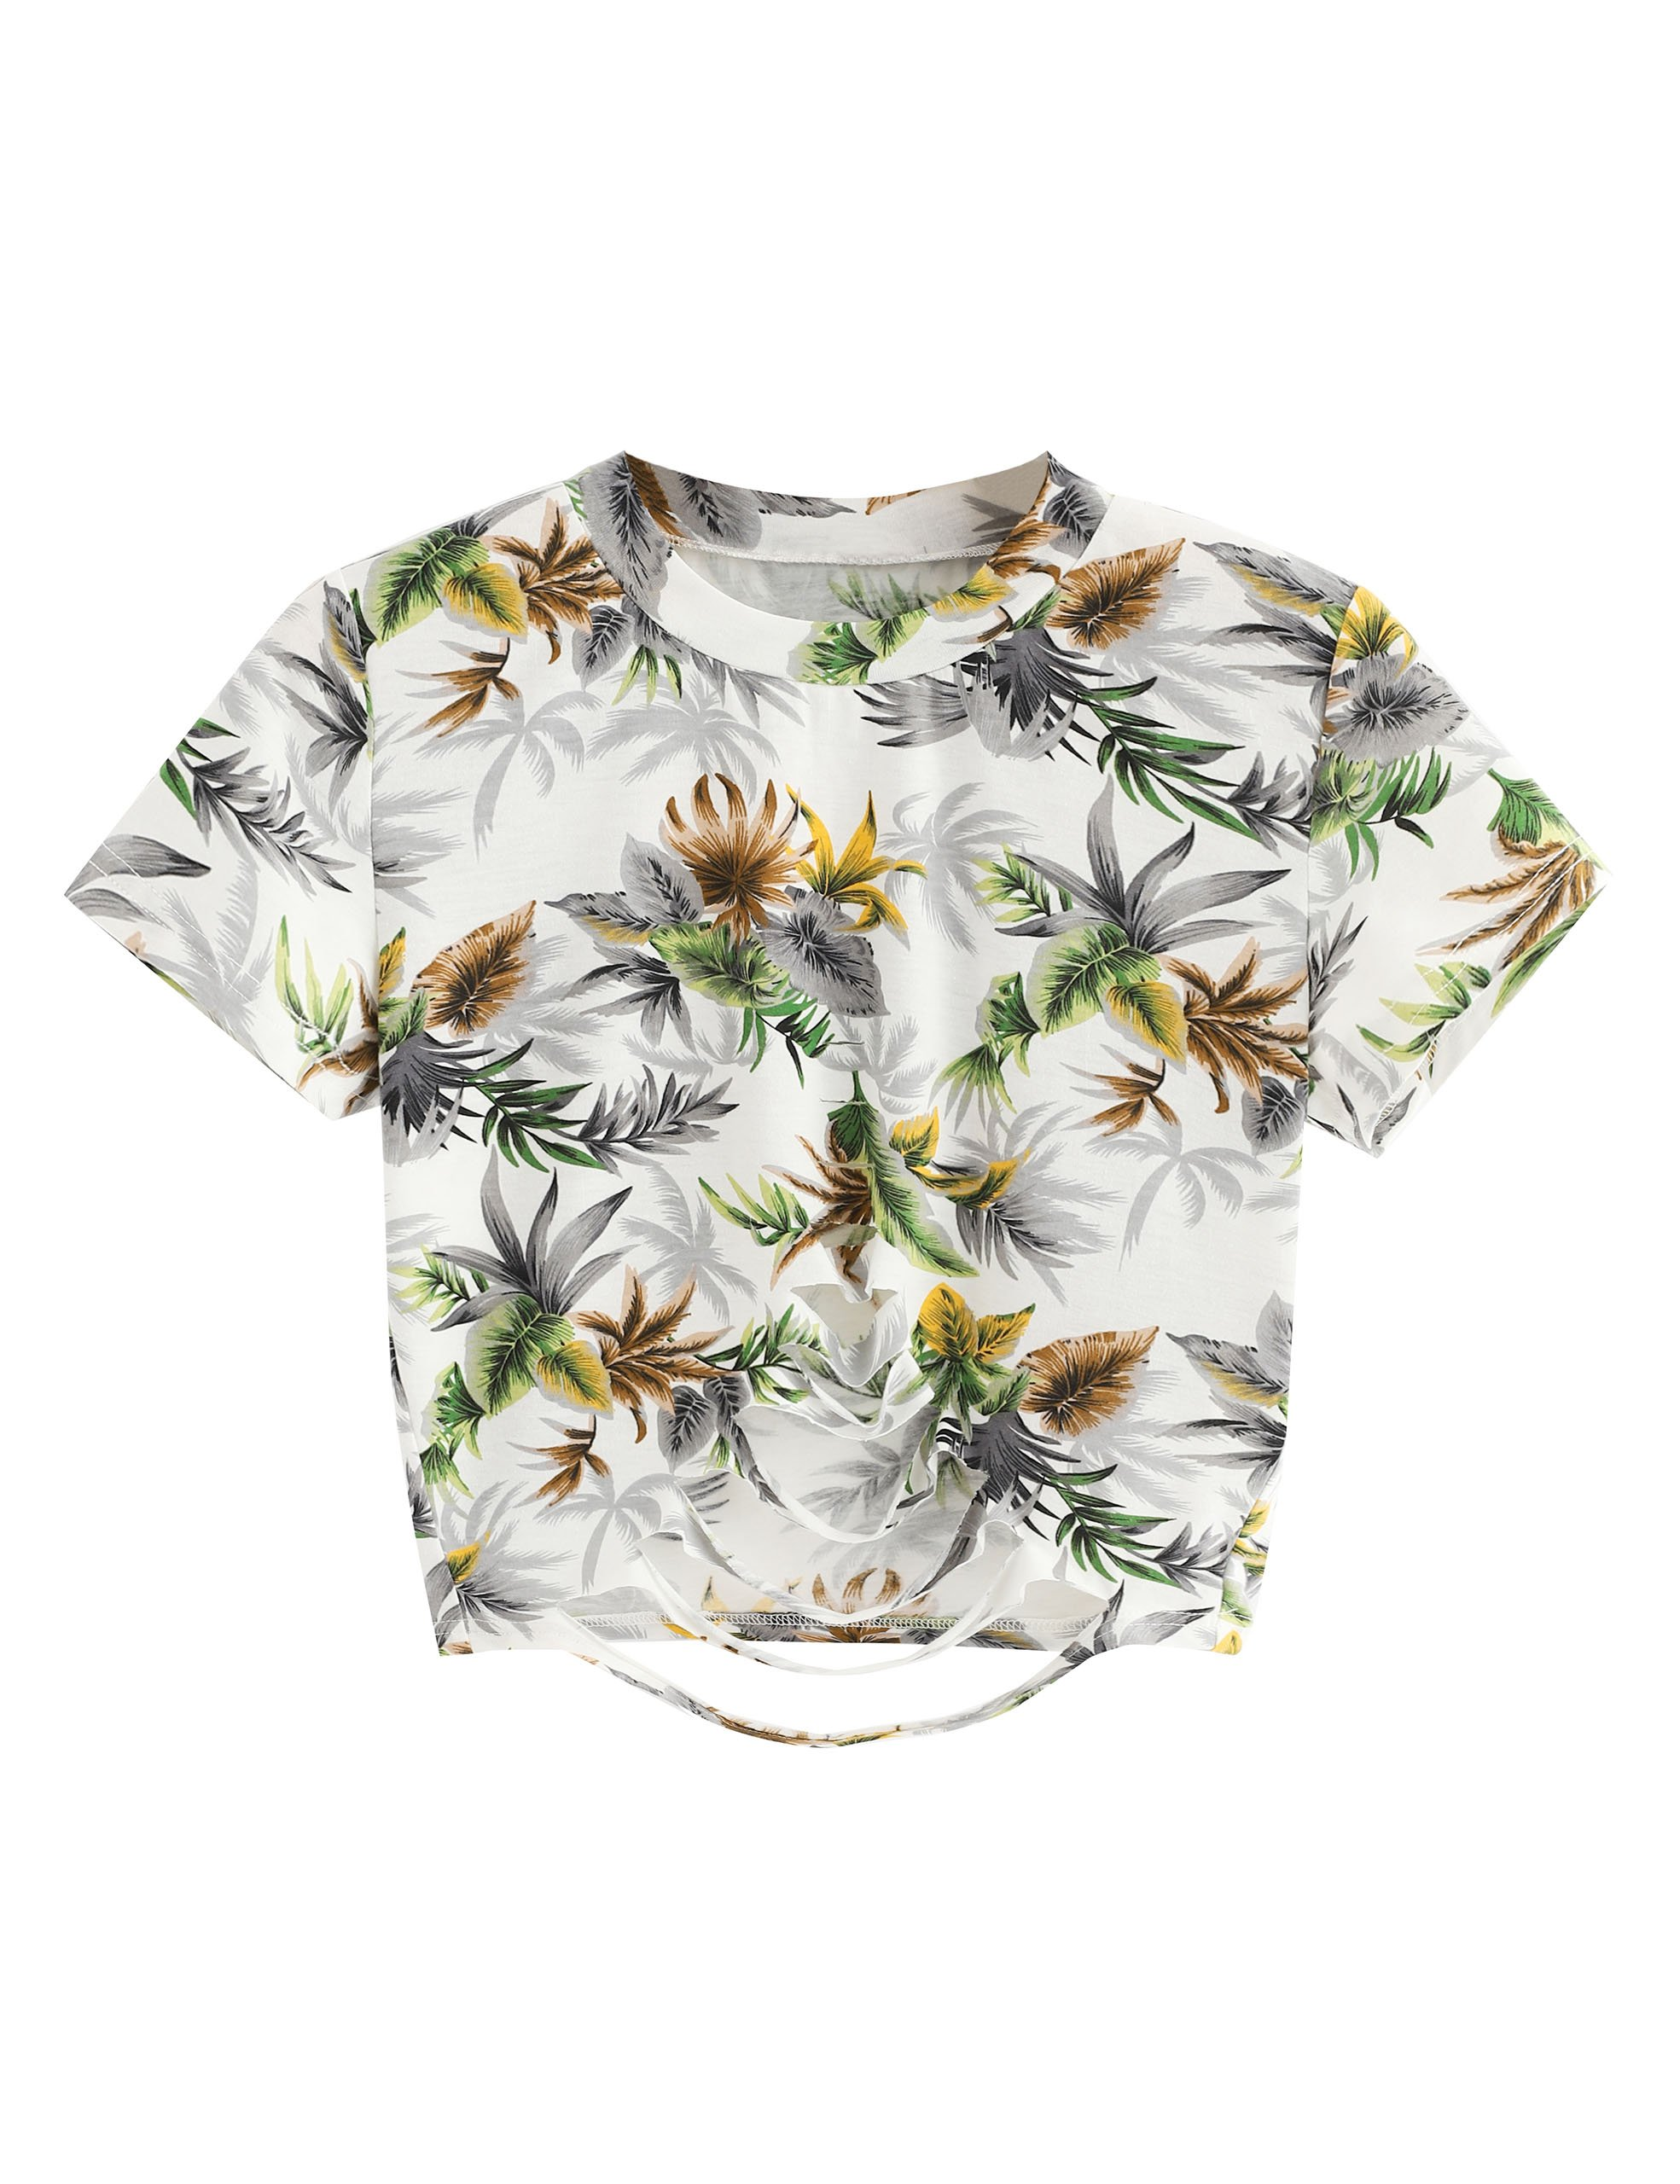 64b4f0452a1c3 Galleon - SweatyRocks Women s Short Sleeve Ripped Tribal Print Crop Top T  Shirt Floral XL